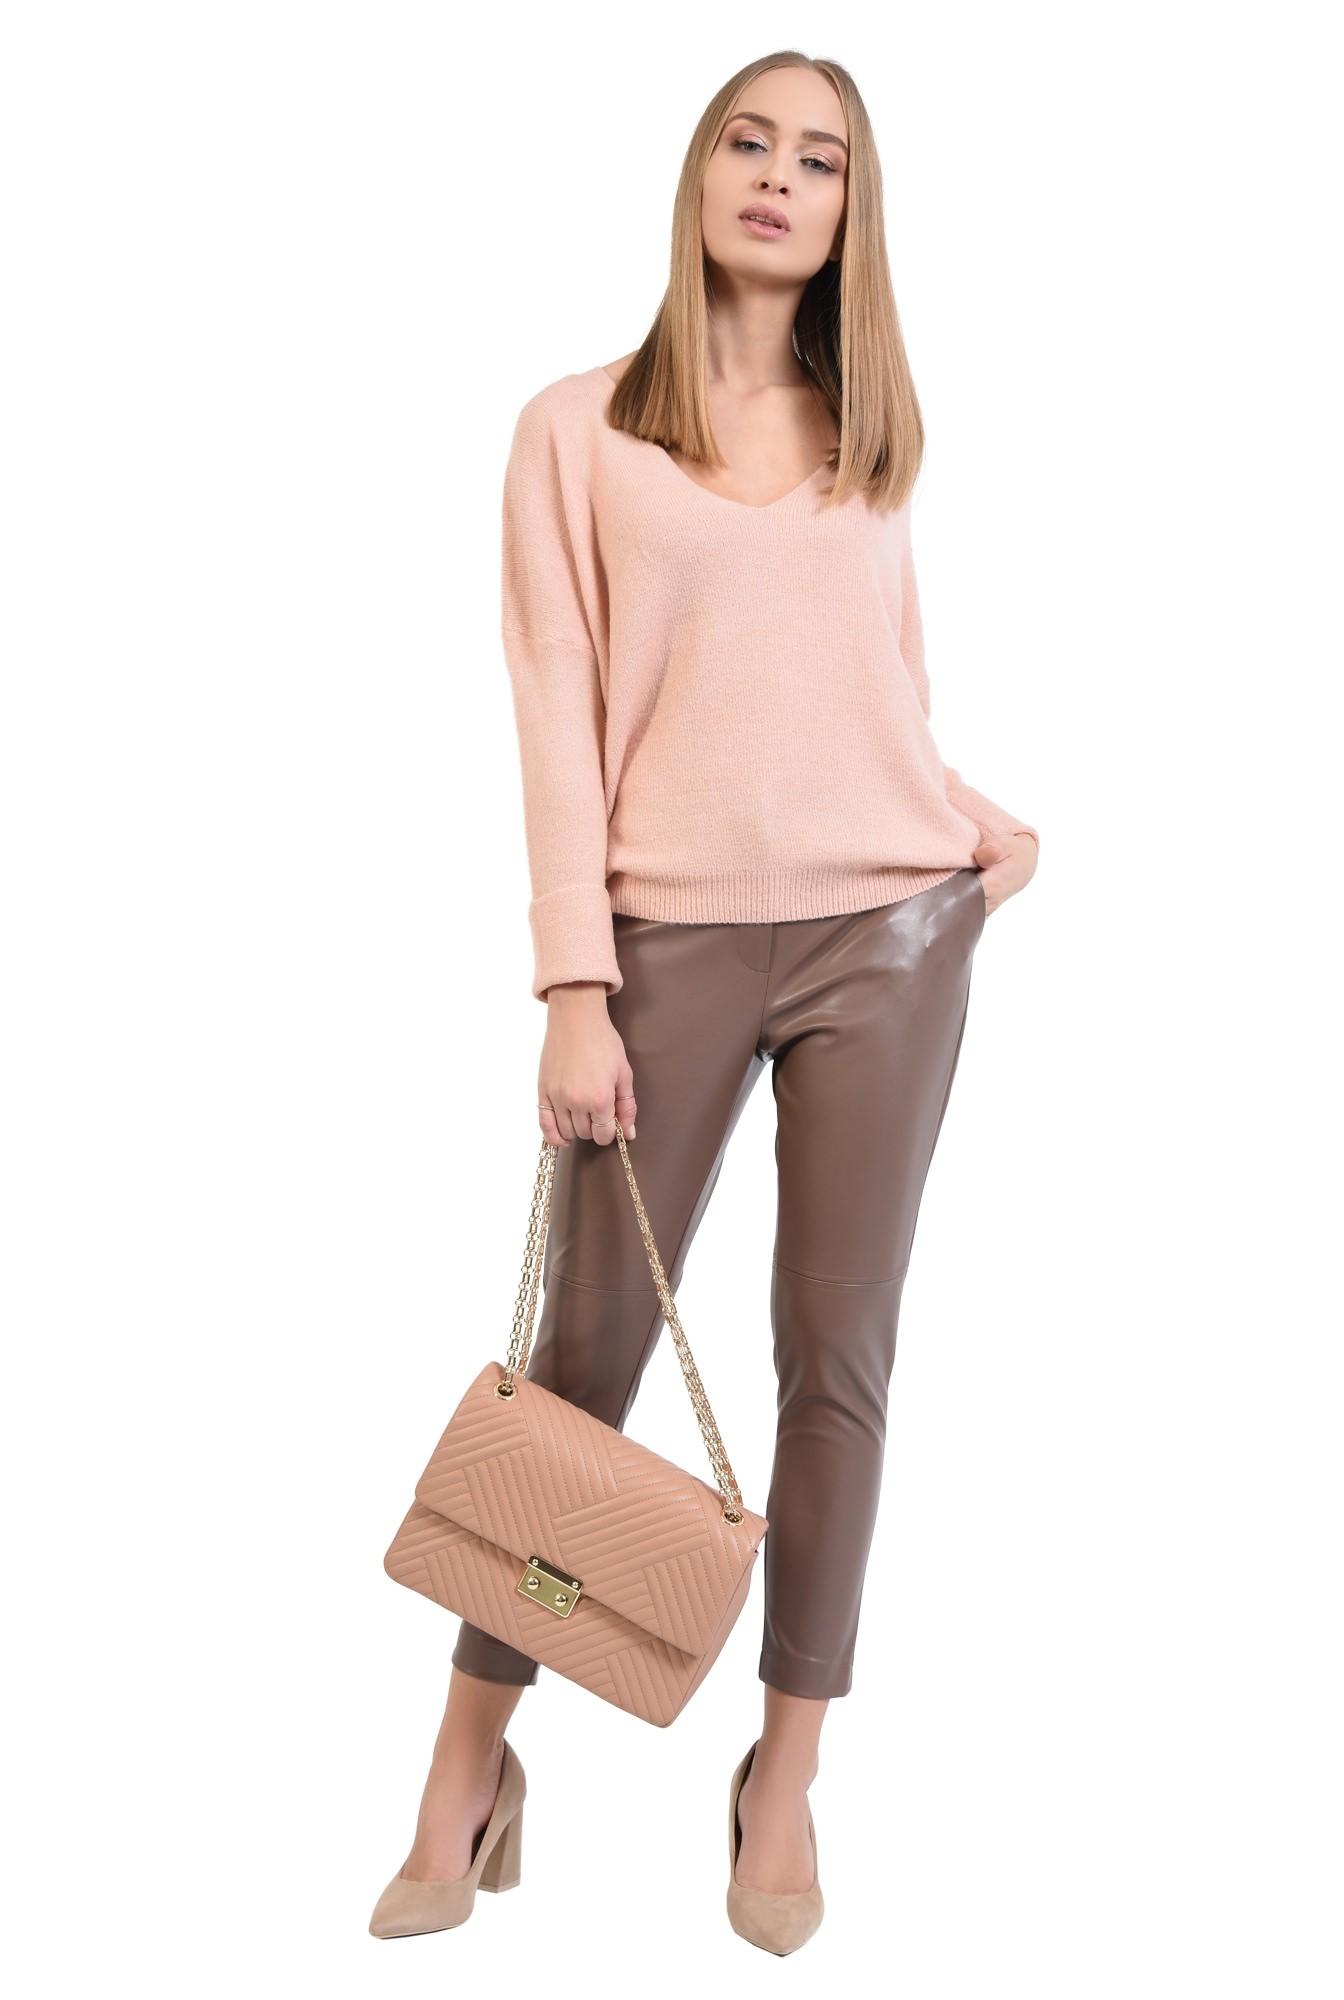 360 - pulover dama, online, tricotaje, roz, bordura reiata